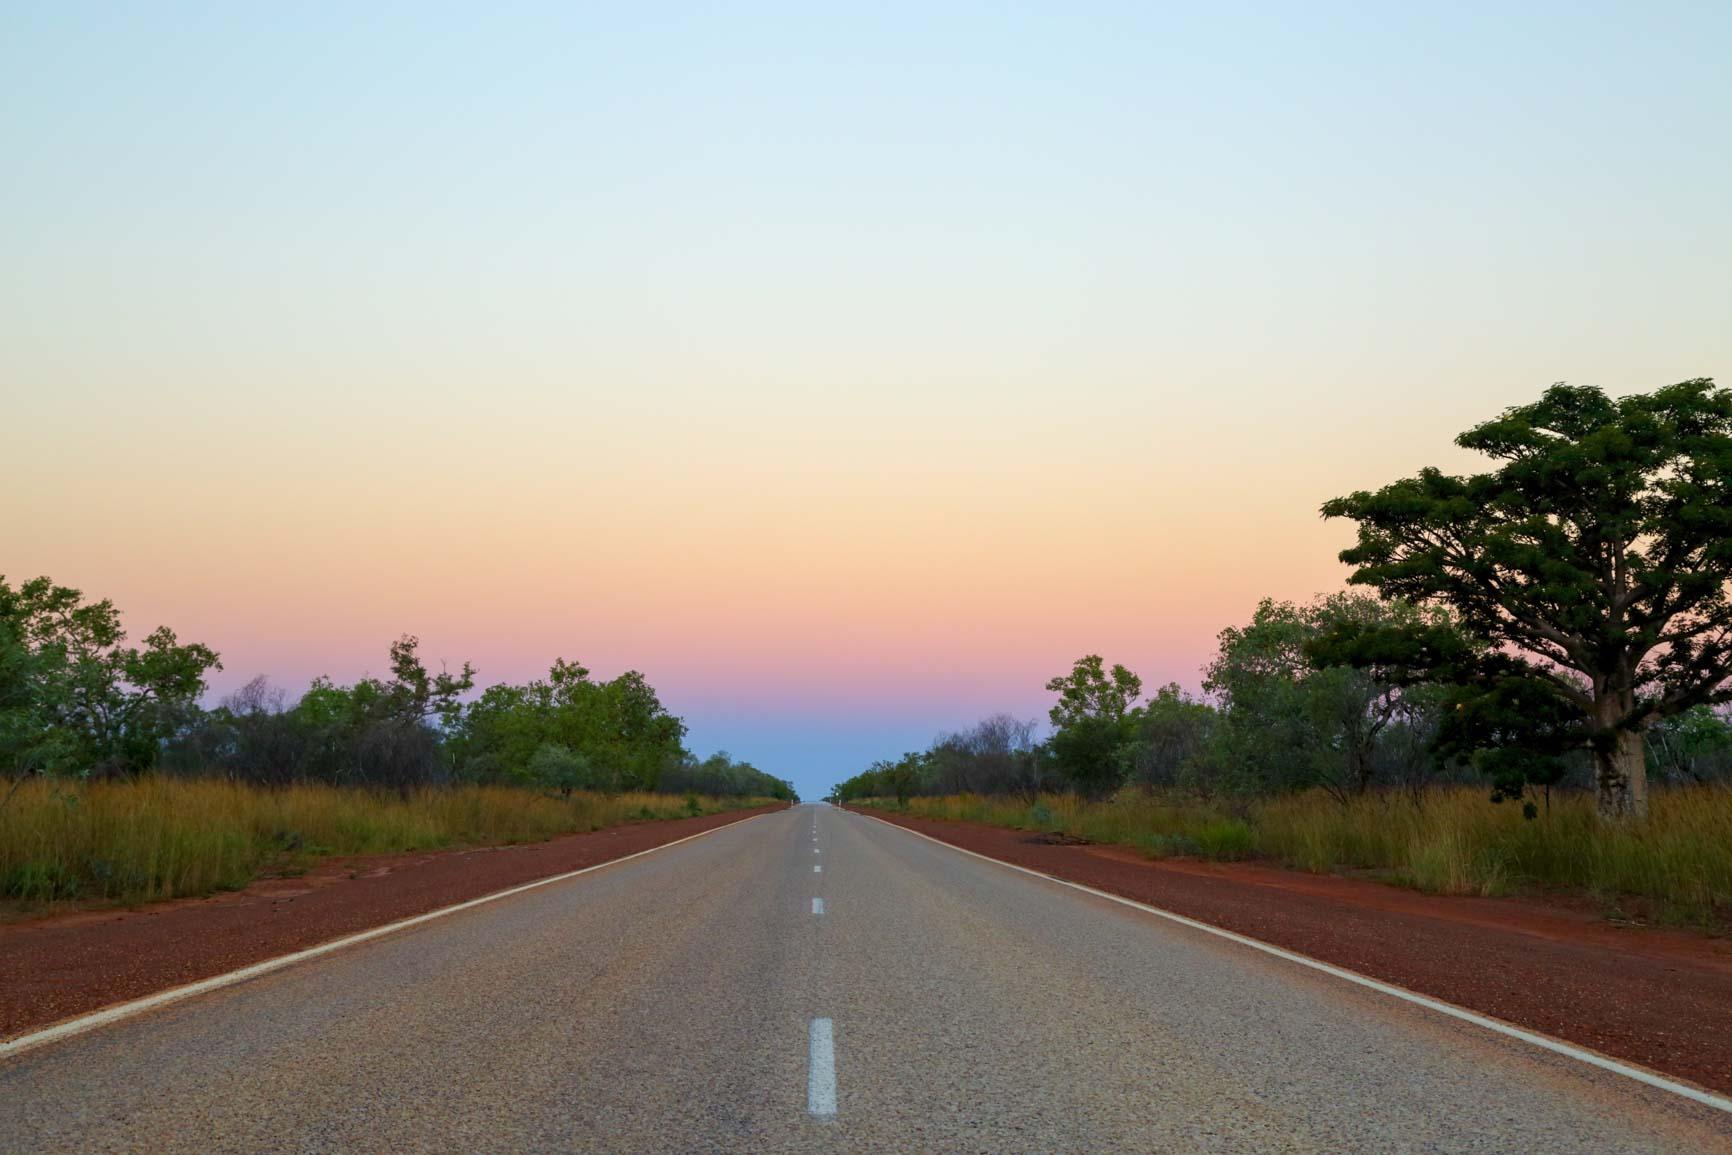 Long empty road cutting through Western Australian country side